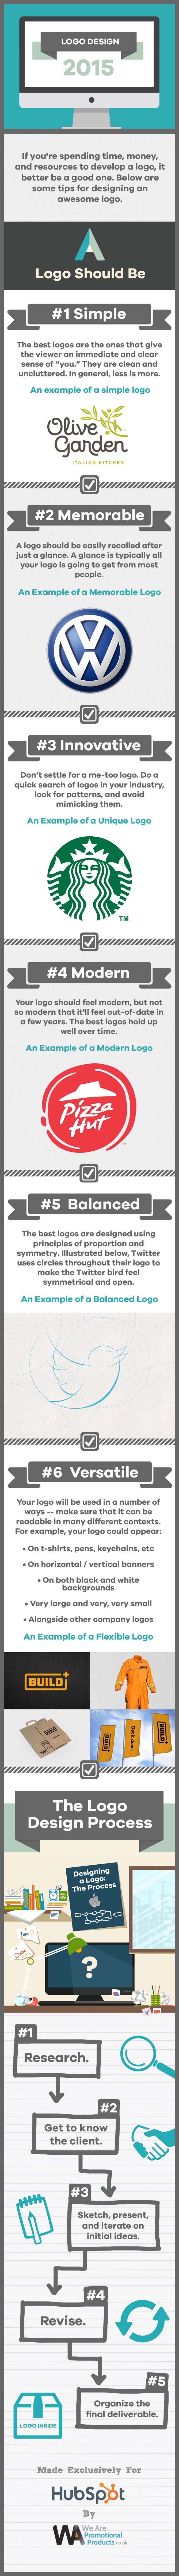 logo-design-infographic